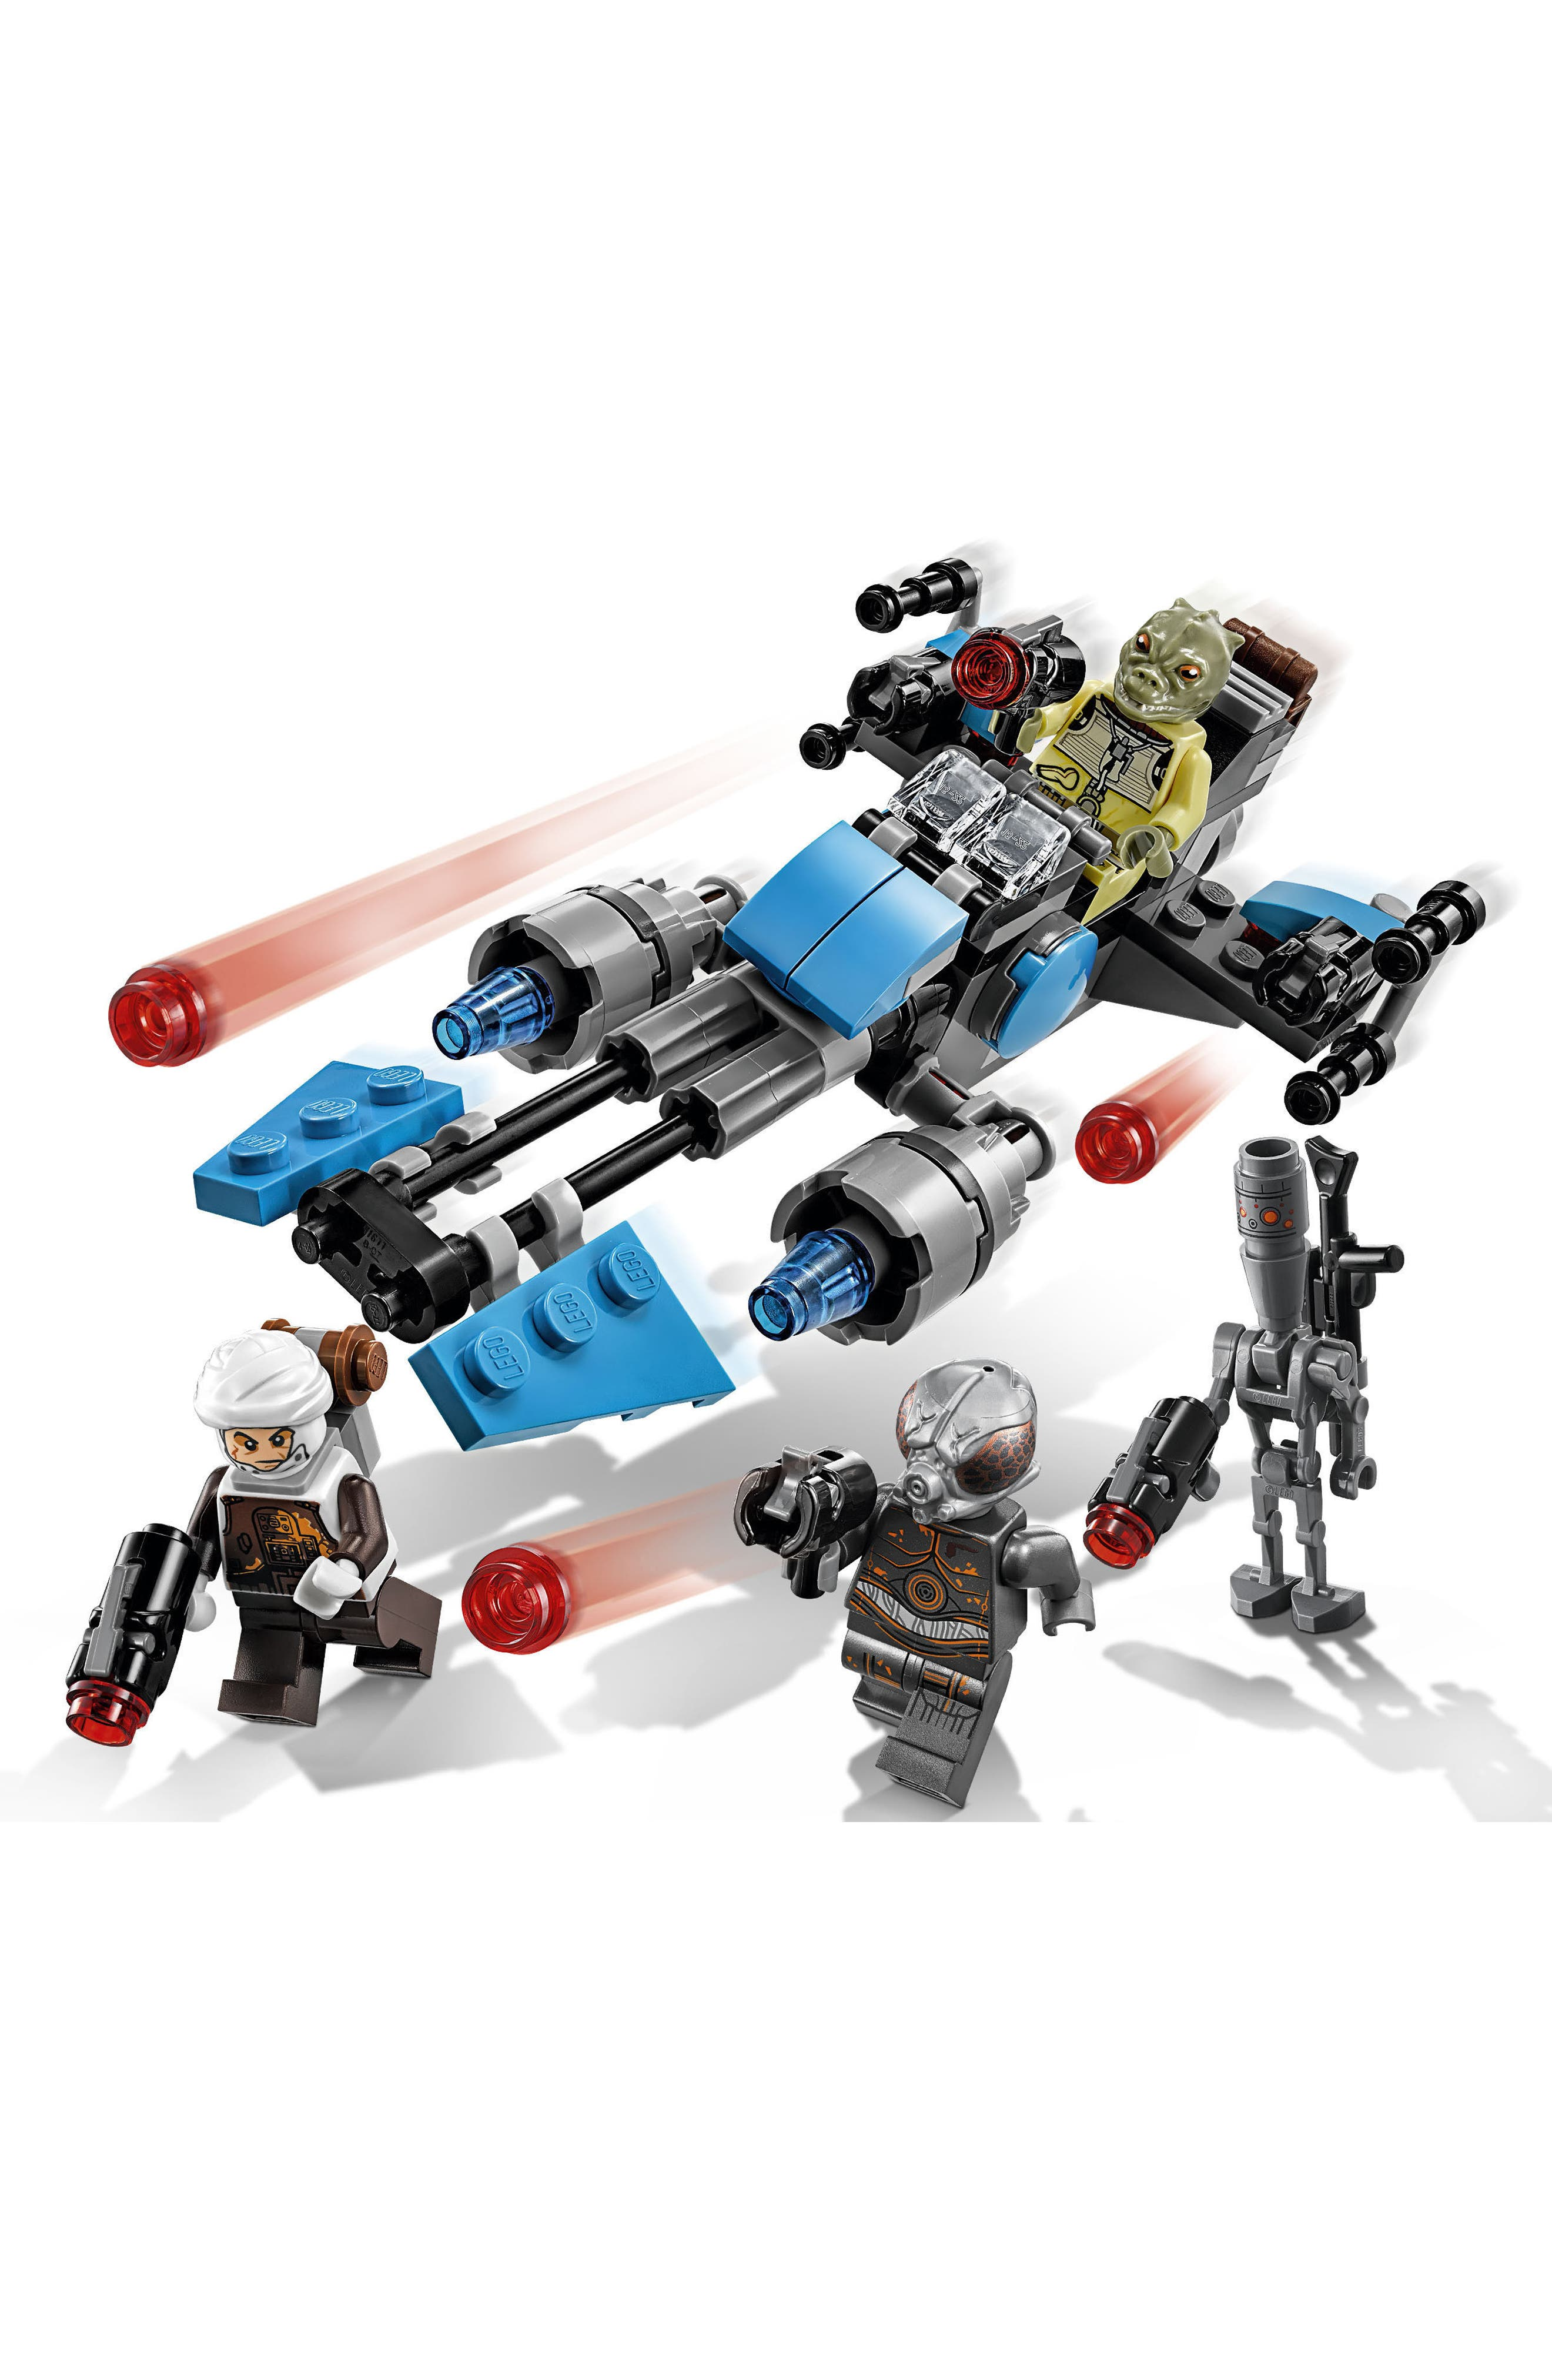 Star Wars<sup>™</sup> Bounty Hunter Speeder Bike<sup>™</sup> Battle Pack - 75167,                             Alternate thumbnail 3, color,                             Multi